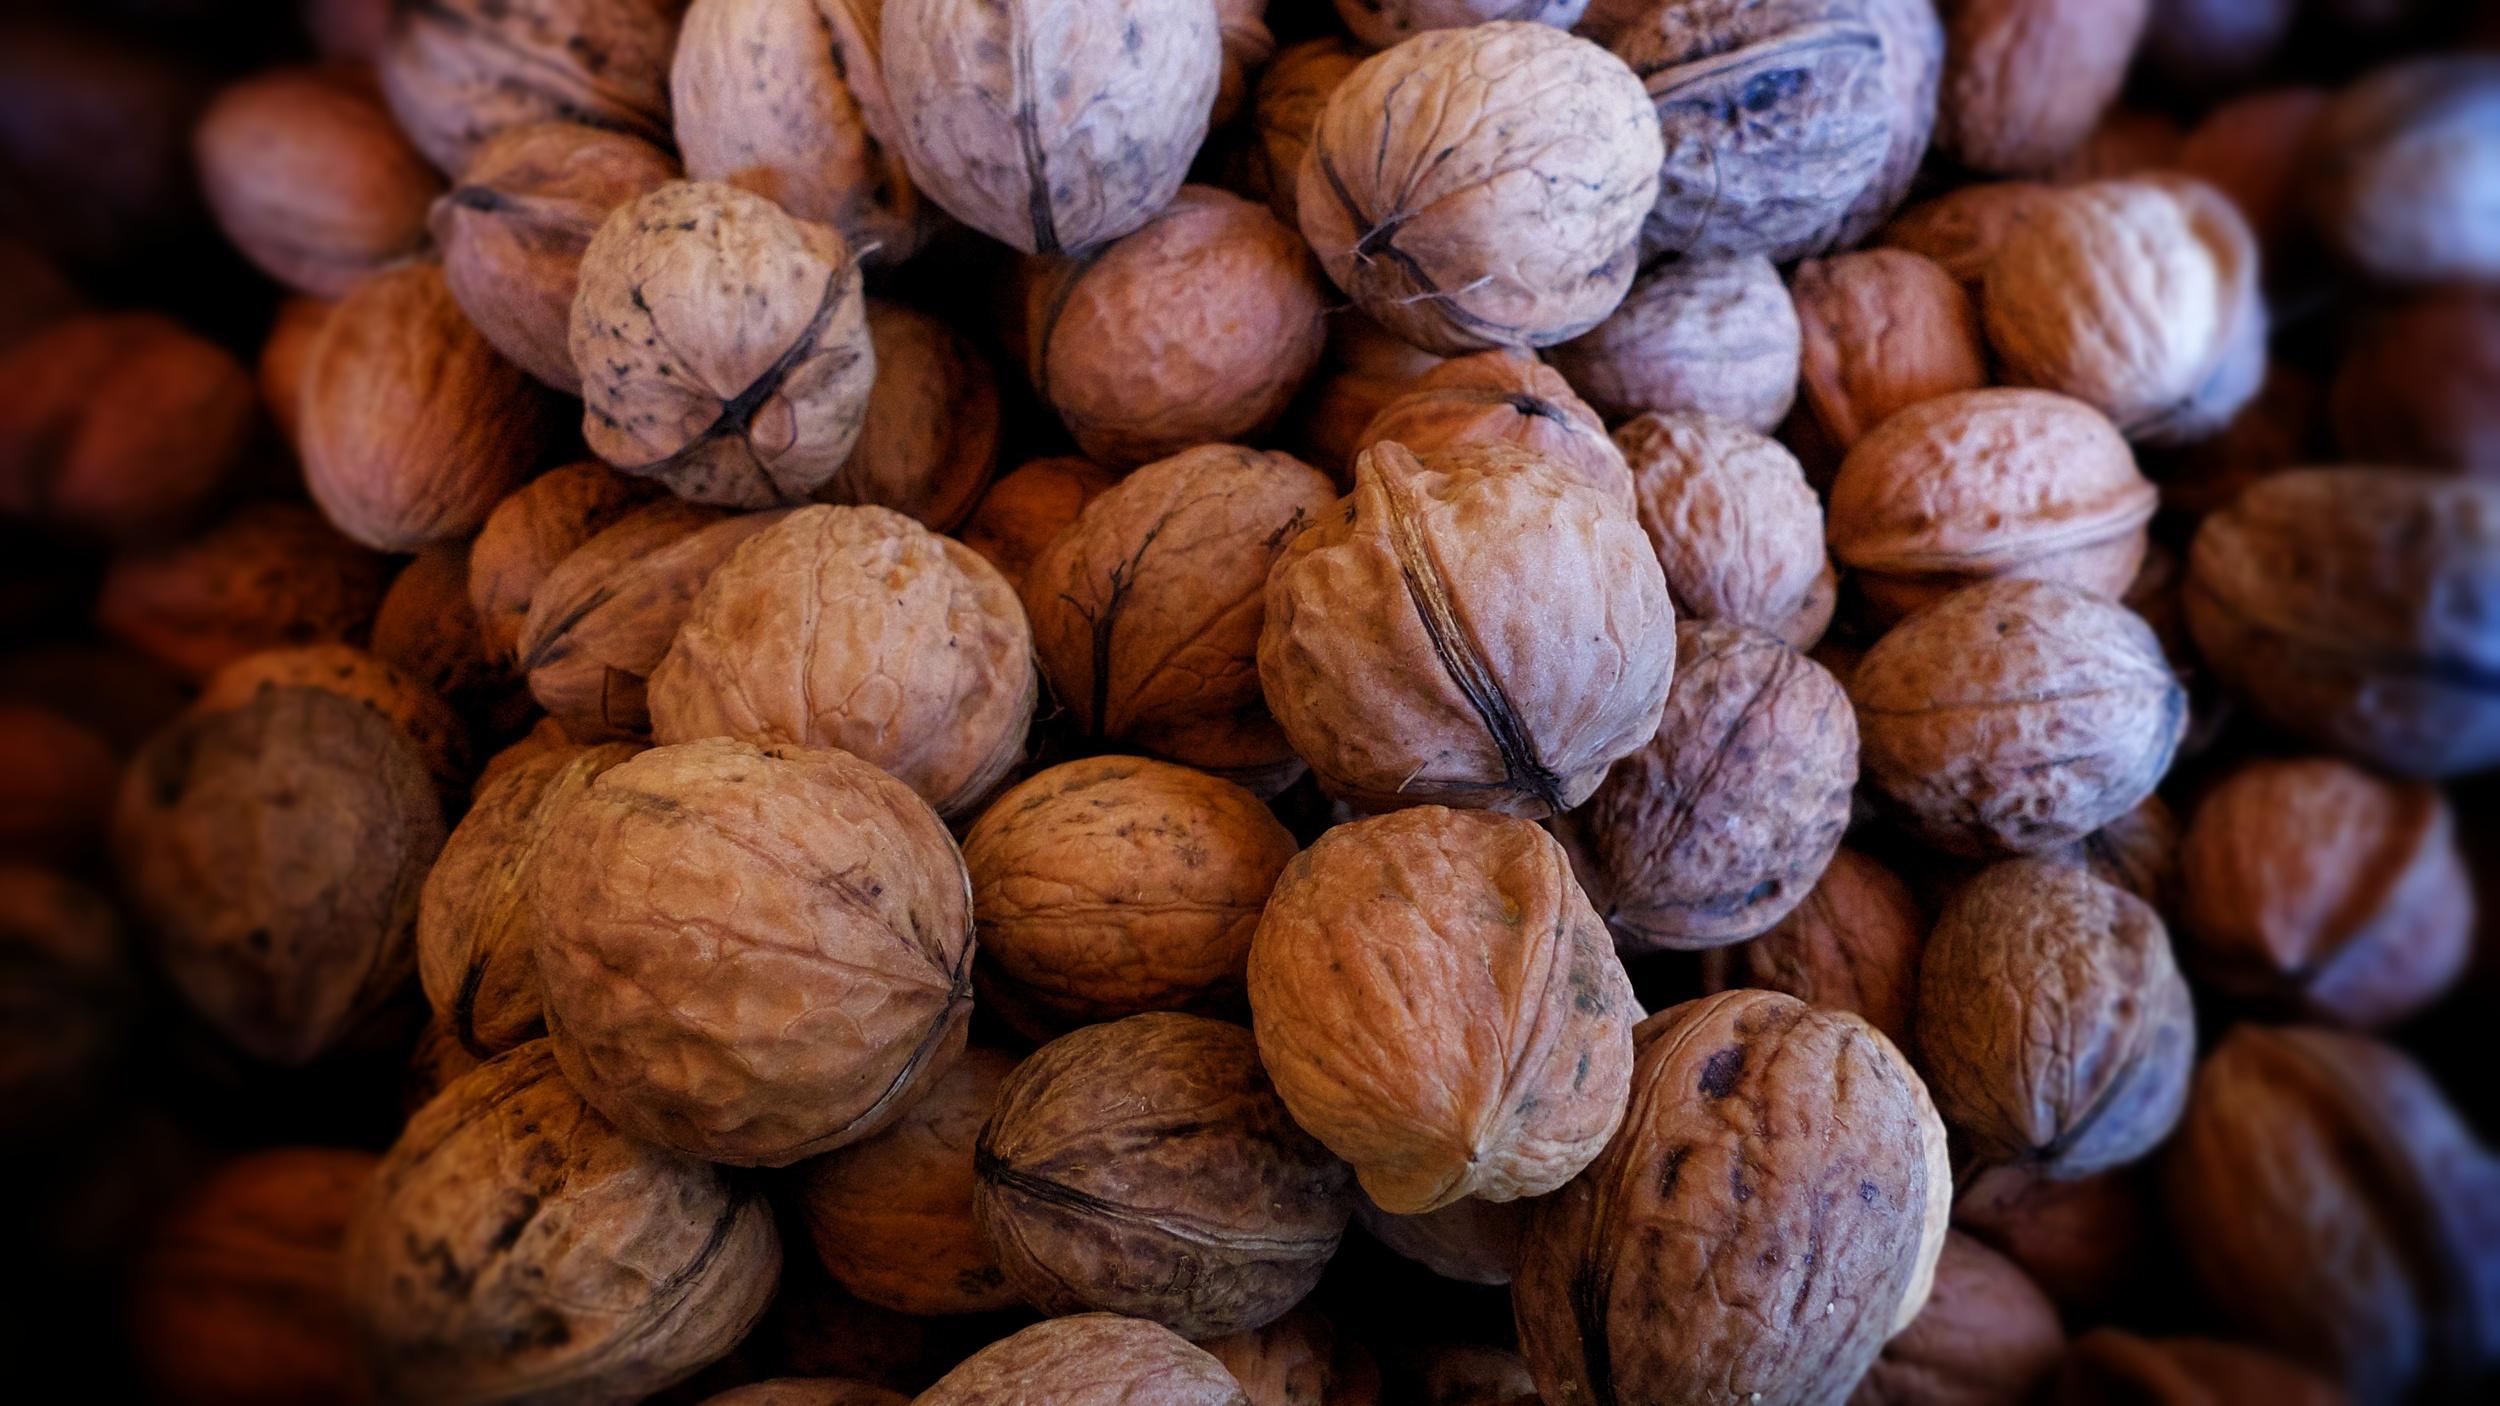 Kronberg Market Chestnuts - from France